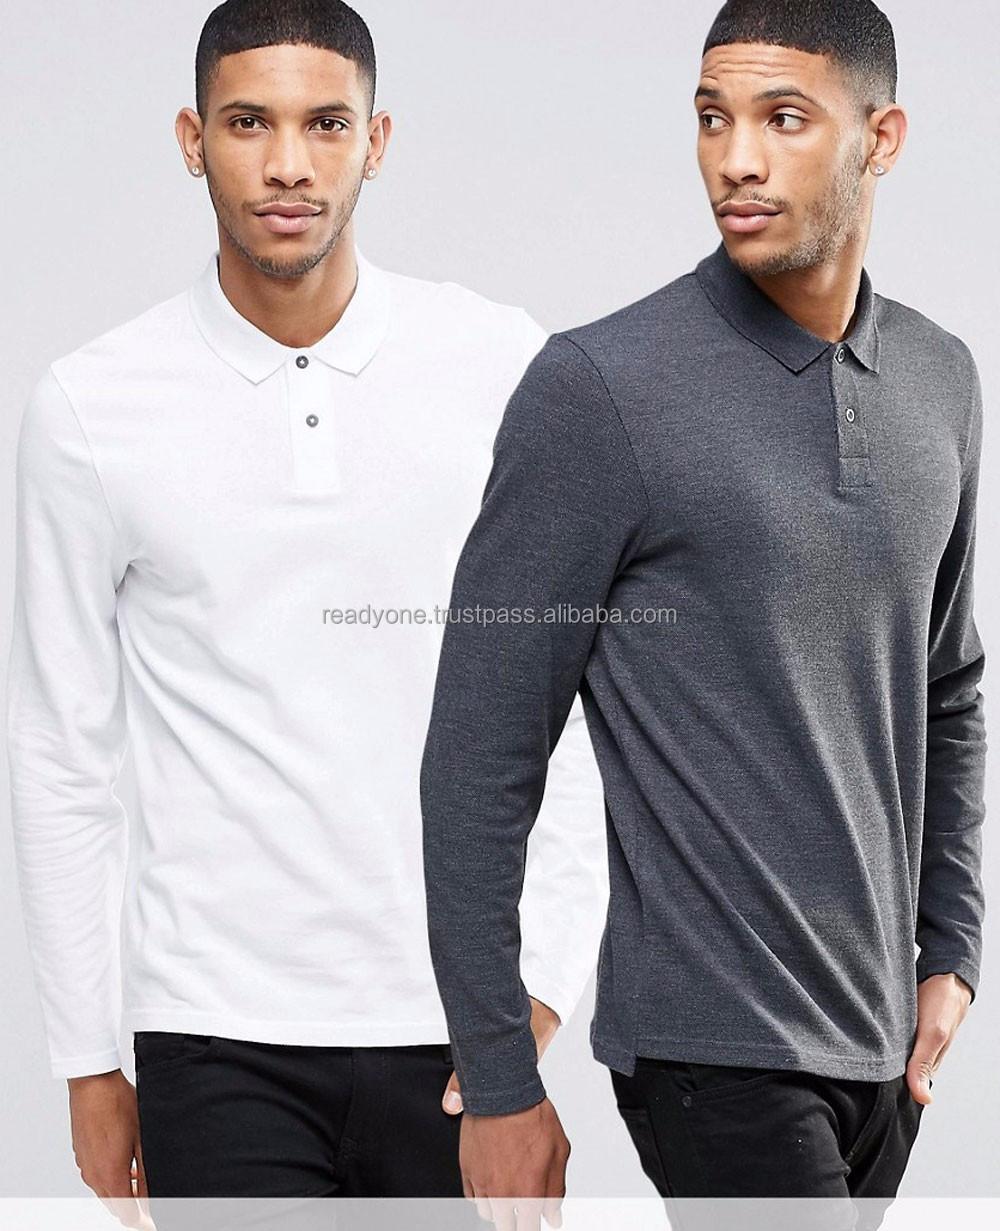 Couple t shirt design white - Cute Couple Shirt Design Polo T Shirt Vertical Striped Men S Polo Shirt Polo Jack Uniform Design Buy Mens Yarn Dyed Stripe Customized Fashionable Long